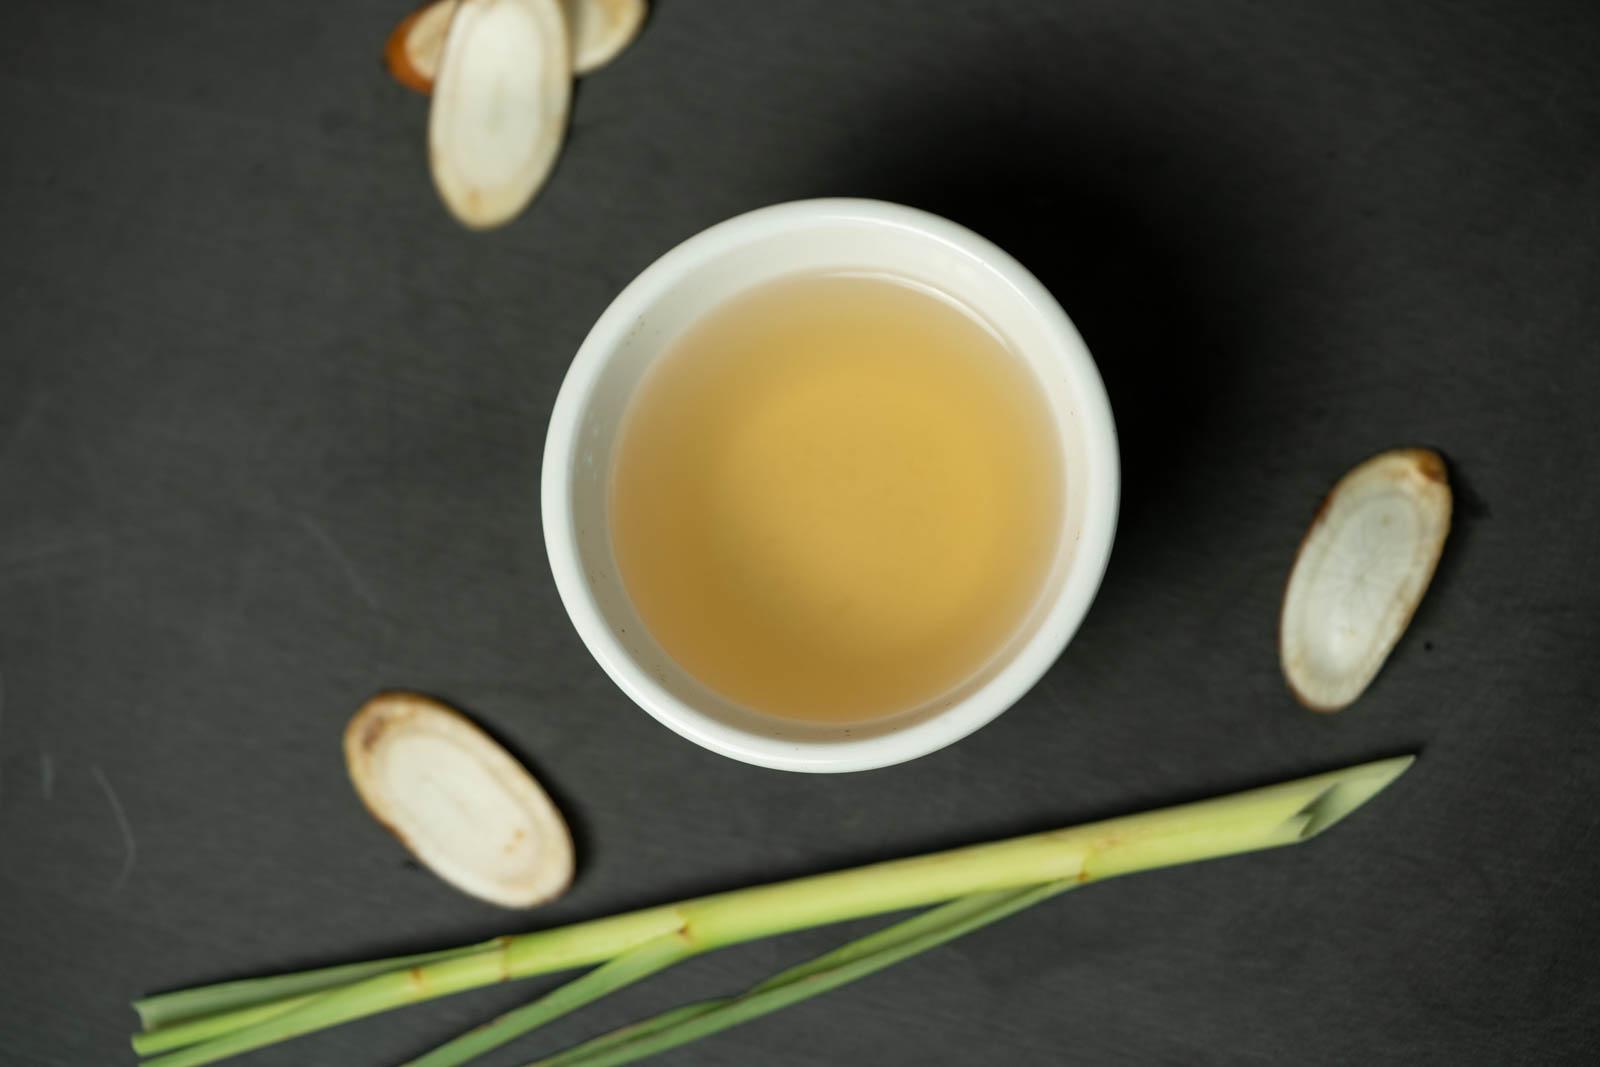 burdock (gobo) tea with lemongrass